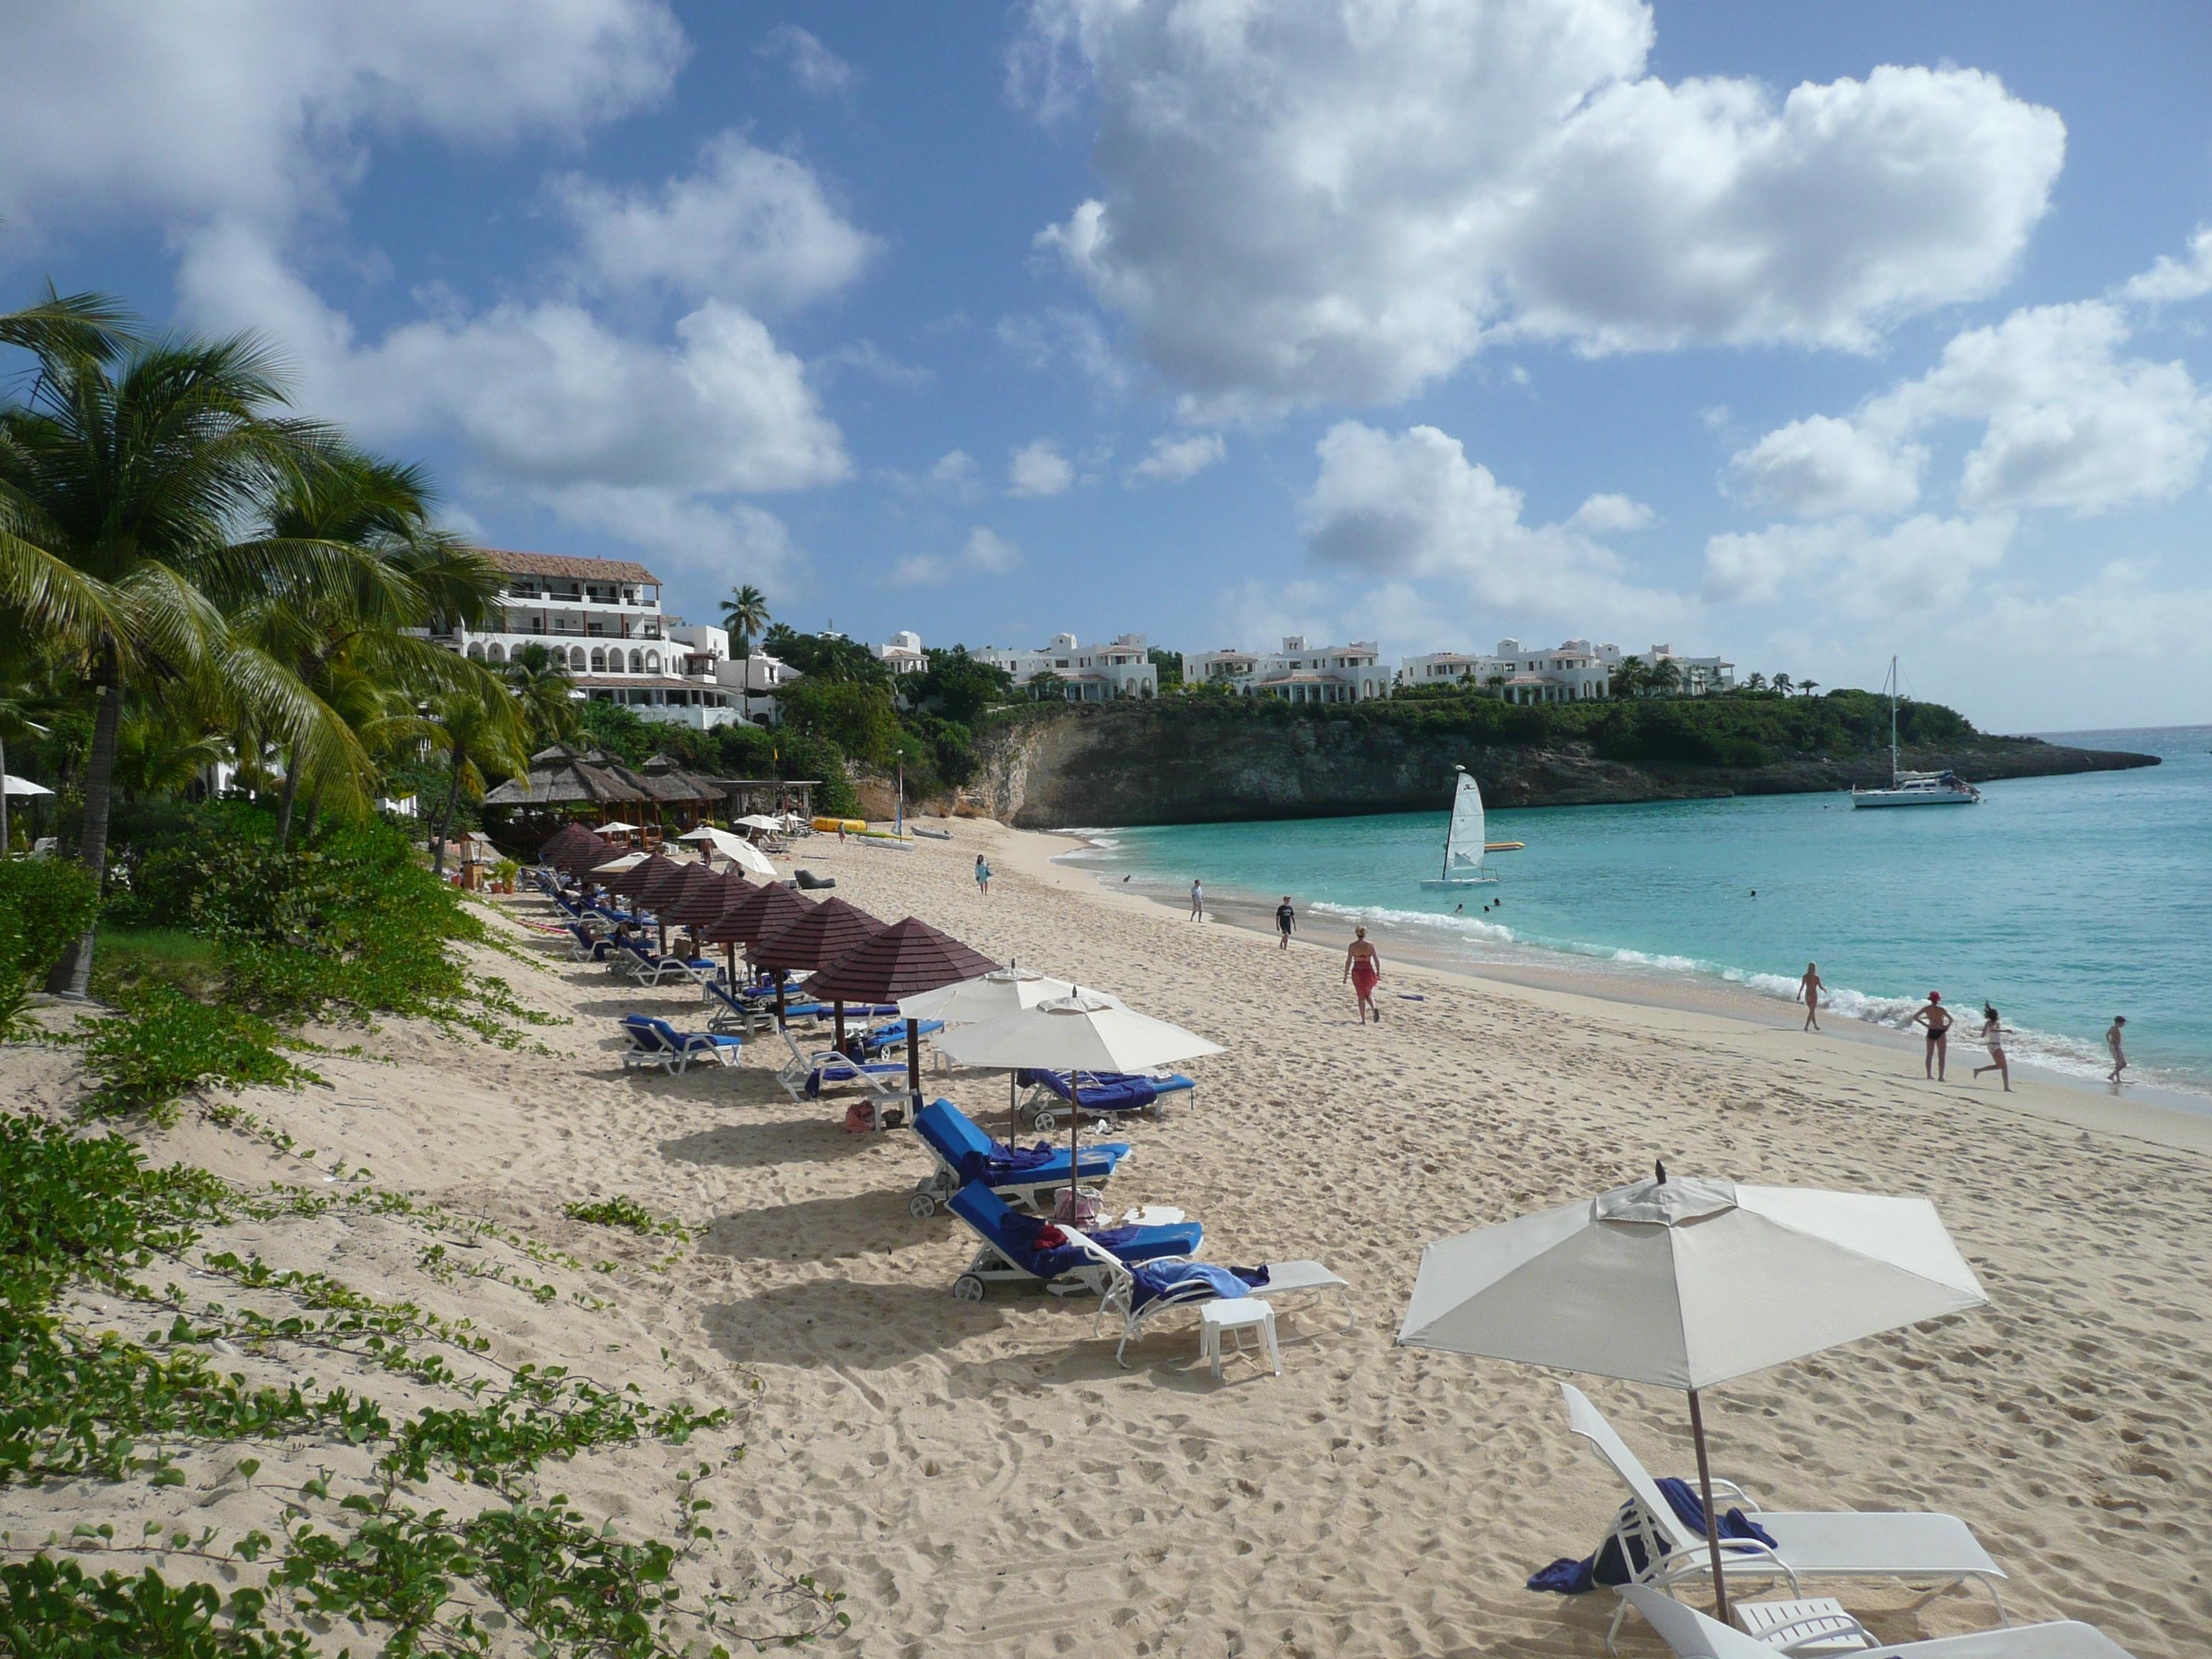 The Dutch/French Island (St. Maarten/St. Martin)